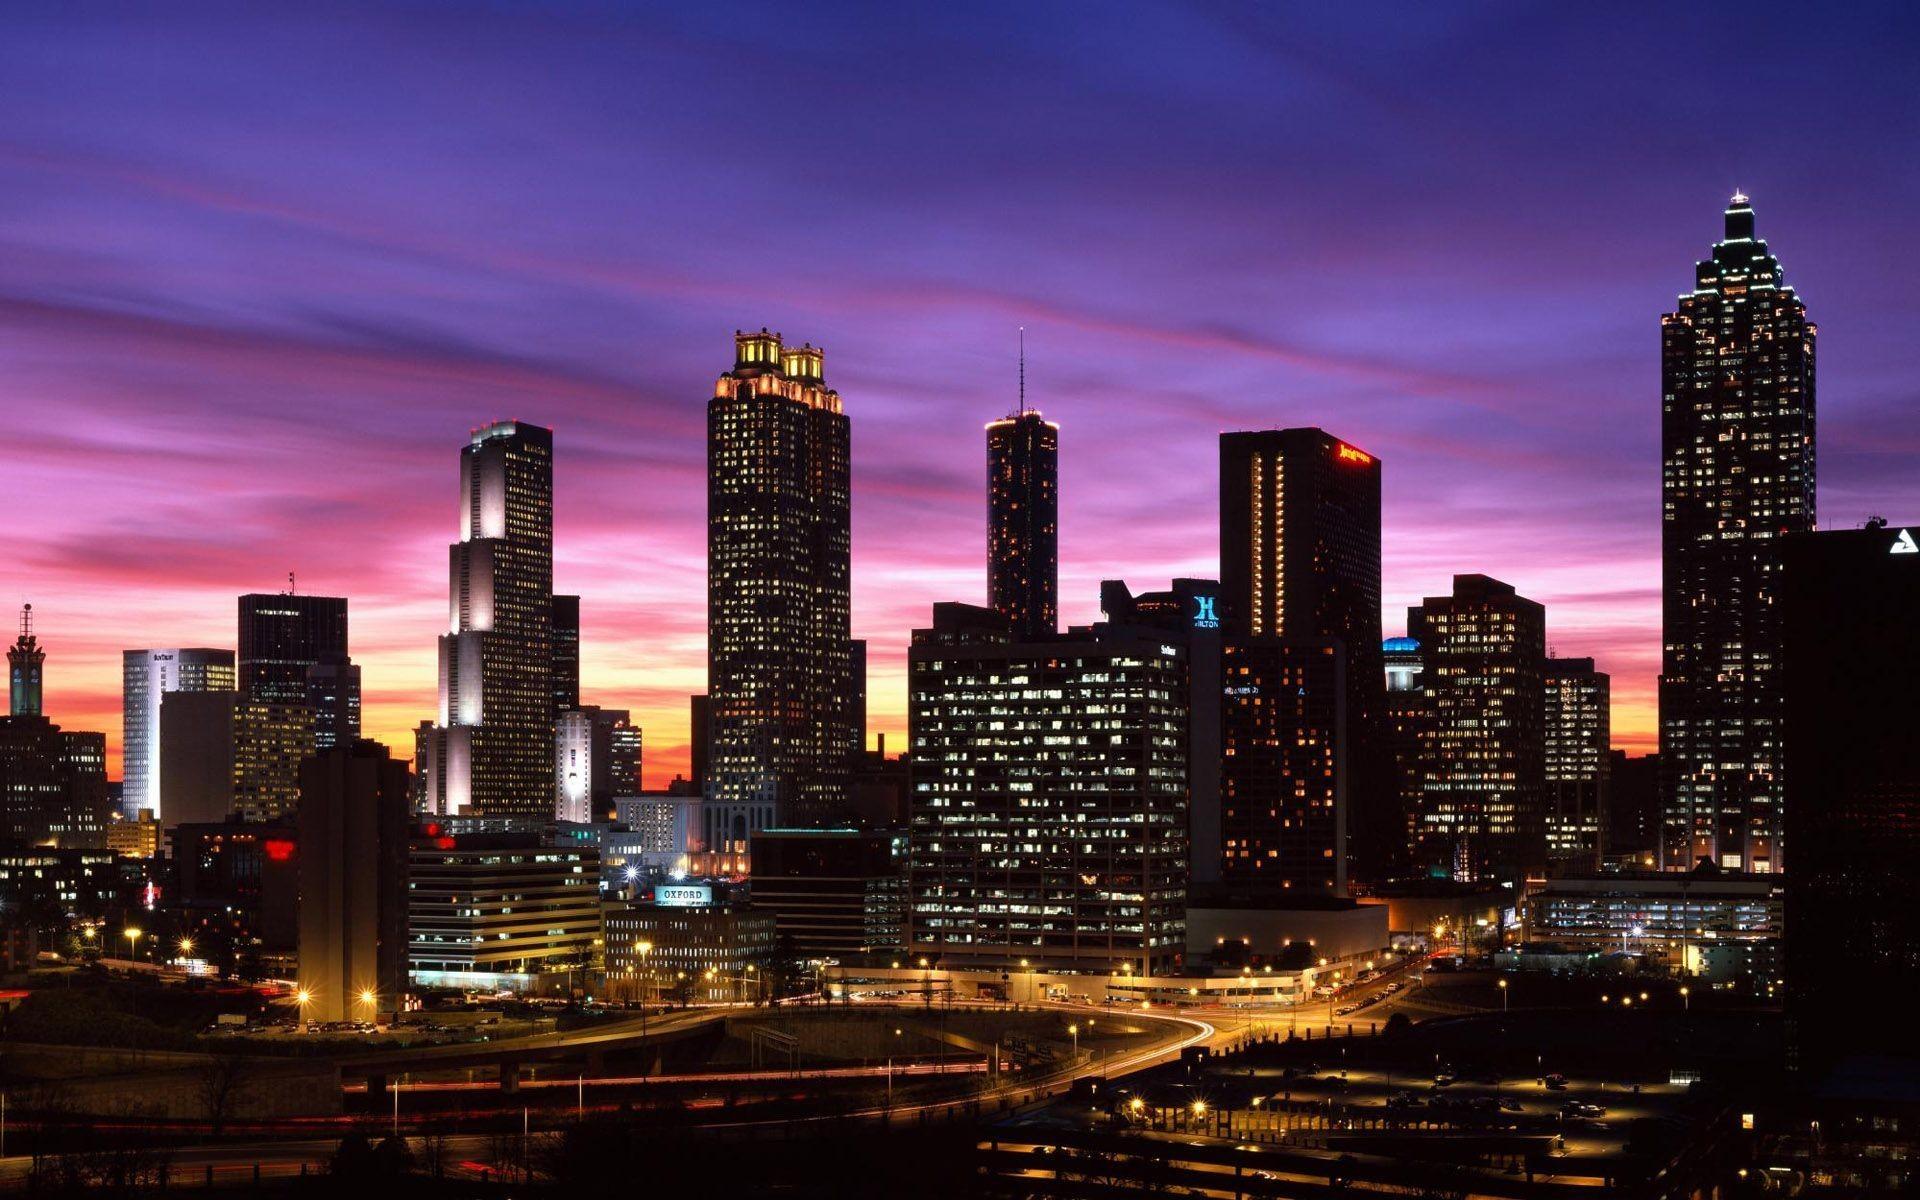 Night City Wallpaper | Landscape Wallpapers | Pinterest | Wallpaper and Hd  wallpaper